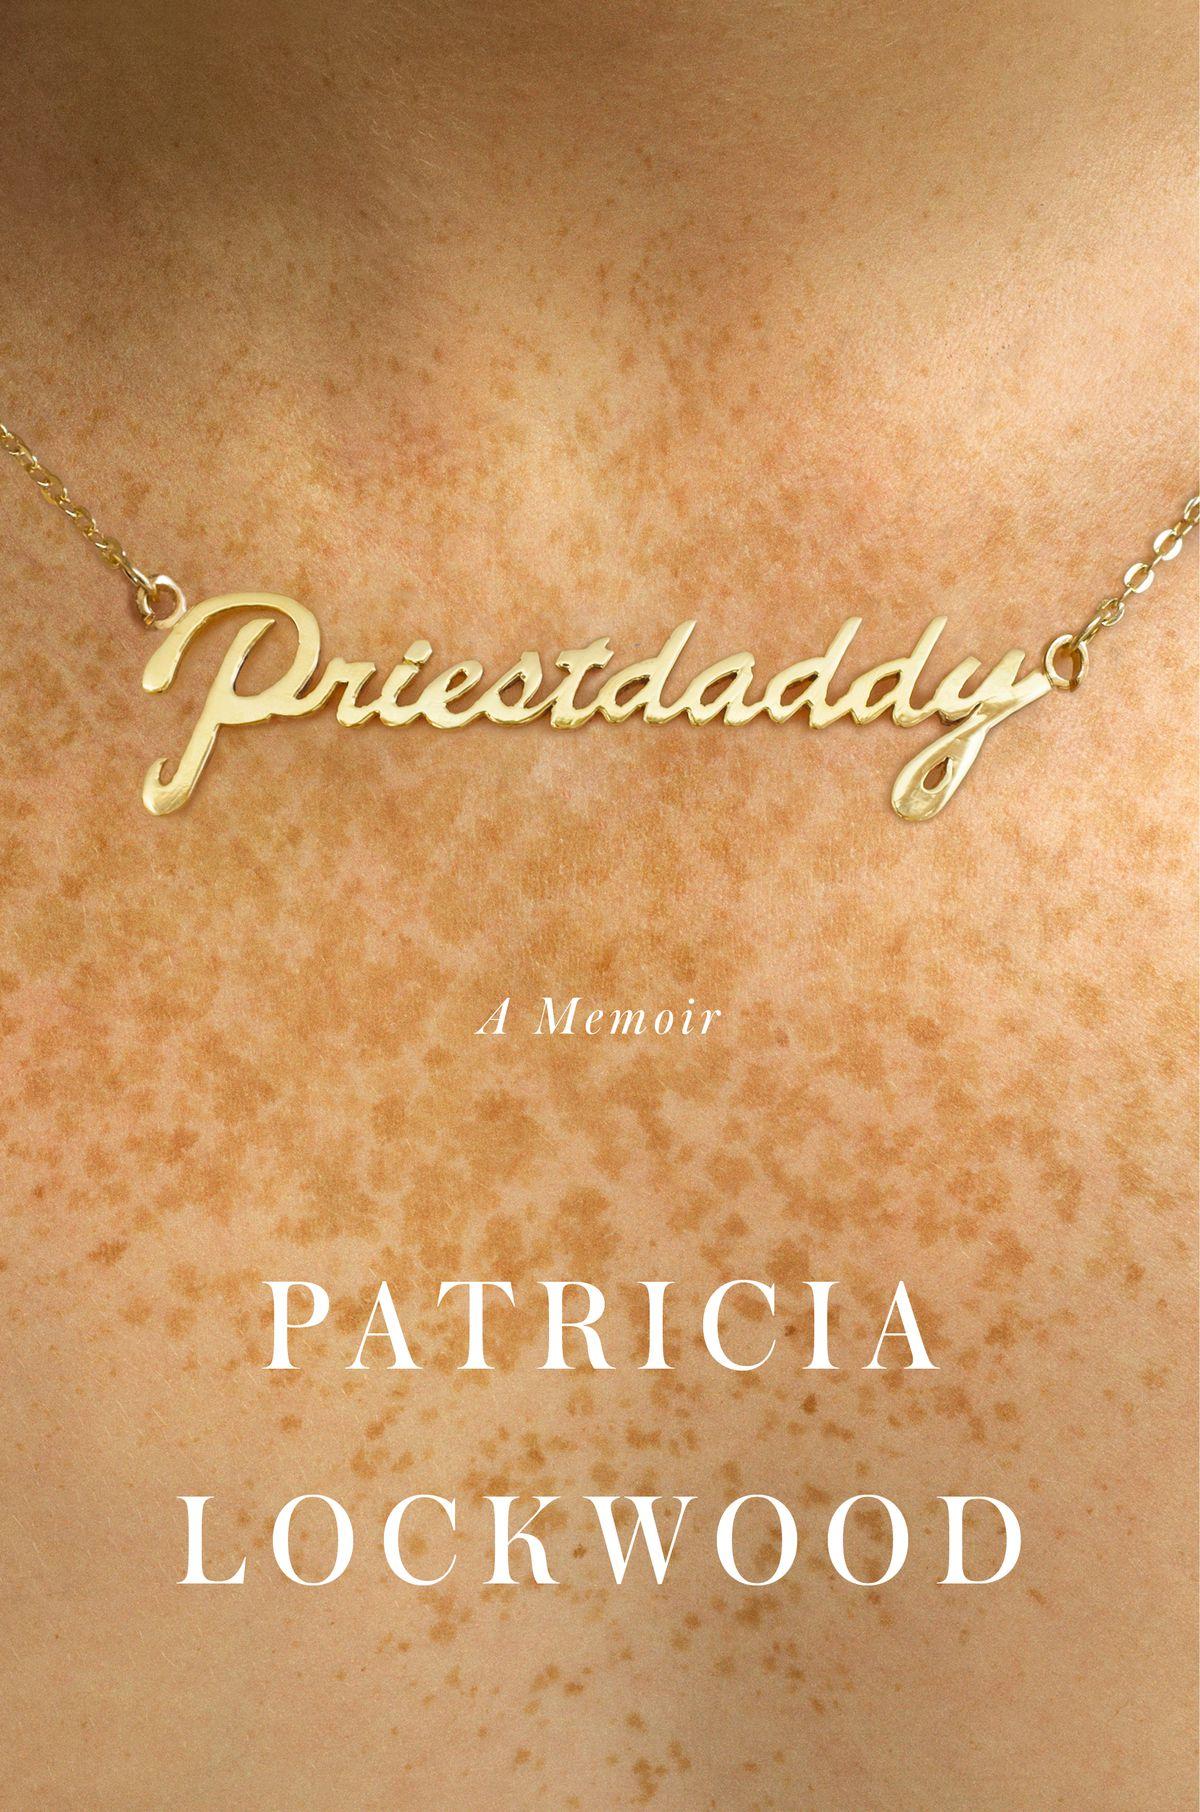 Priestdaddy, by Patricia Lockwood